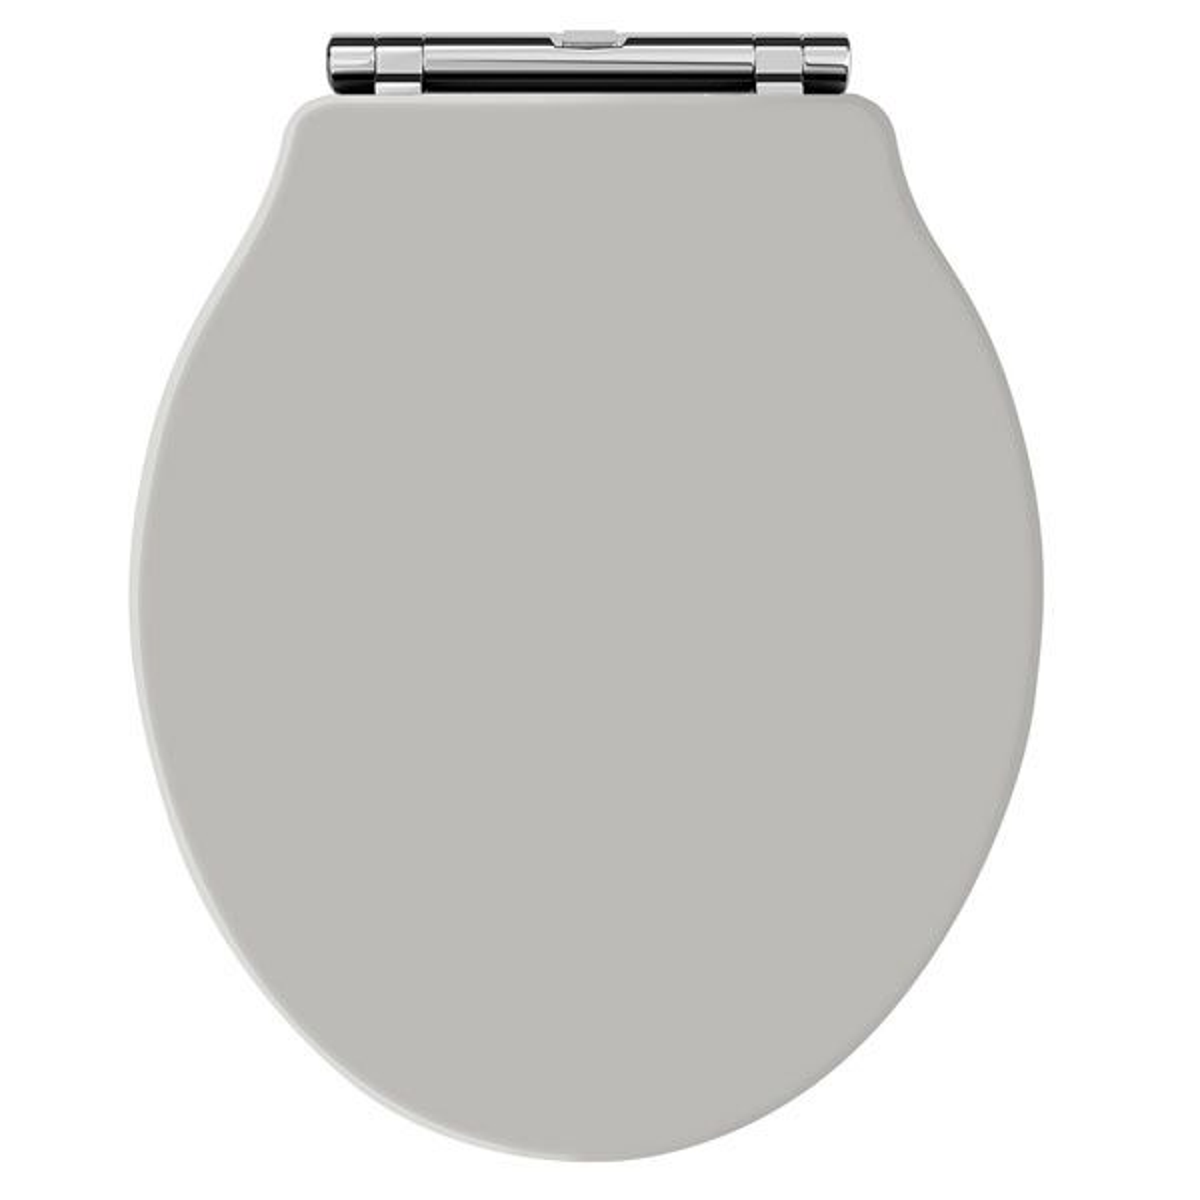 Premier Ryther Stone Grey Wooden Toilet Seat